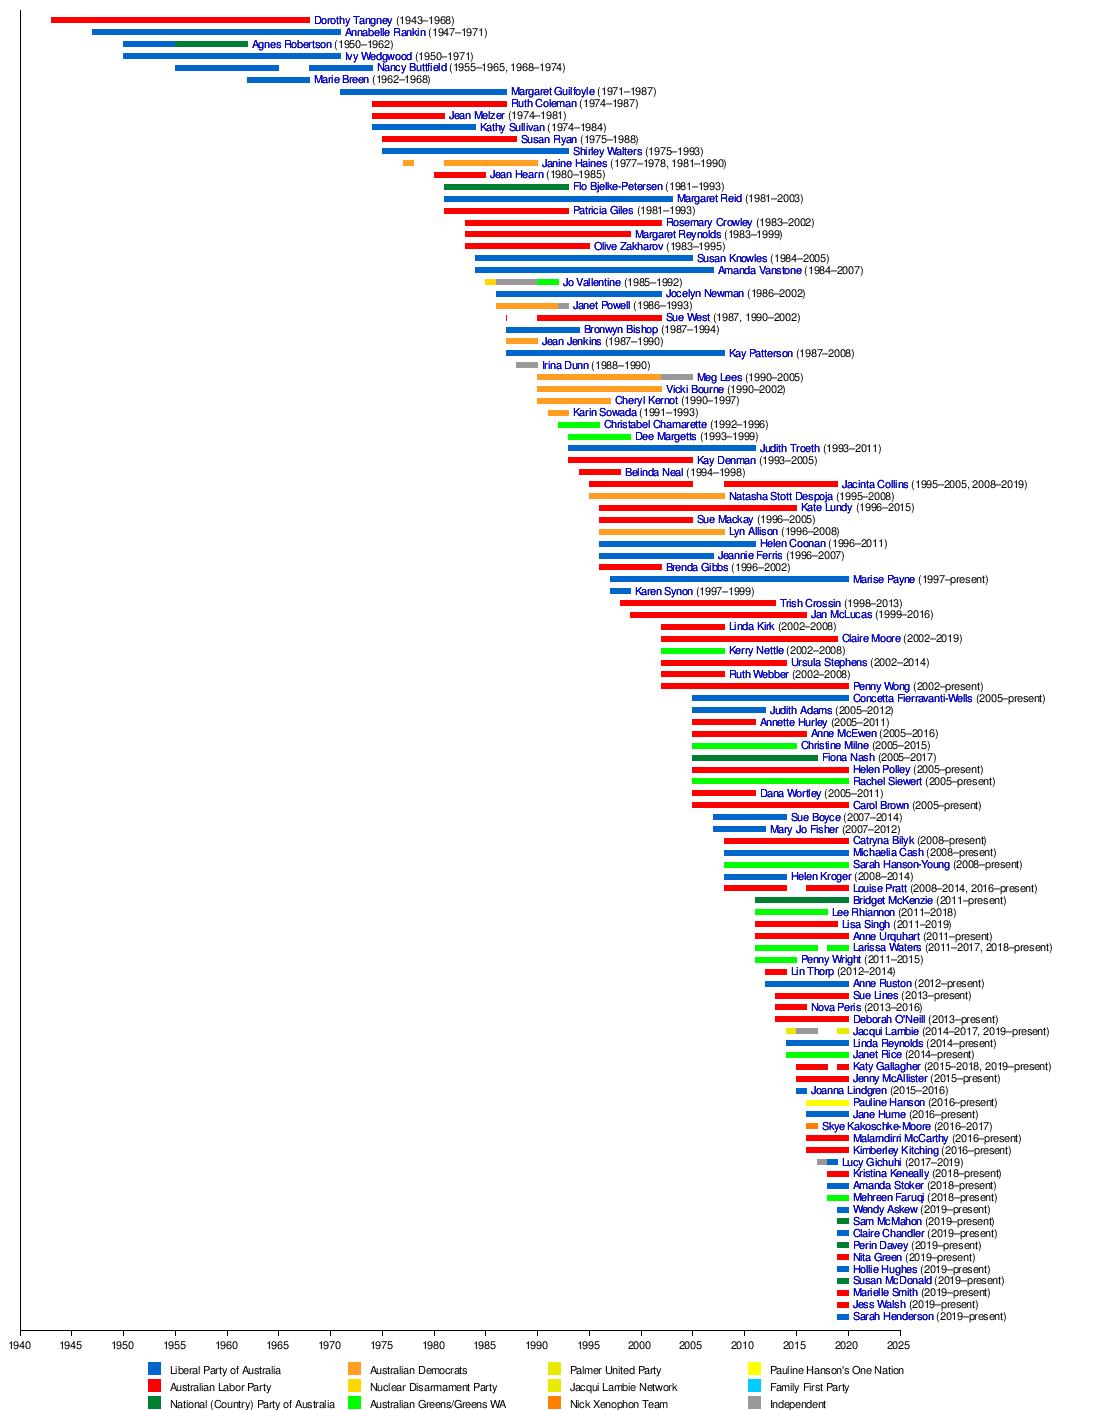 Women in the Australian Senate - Wikipedia